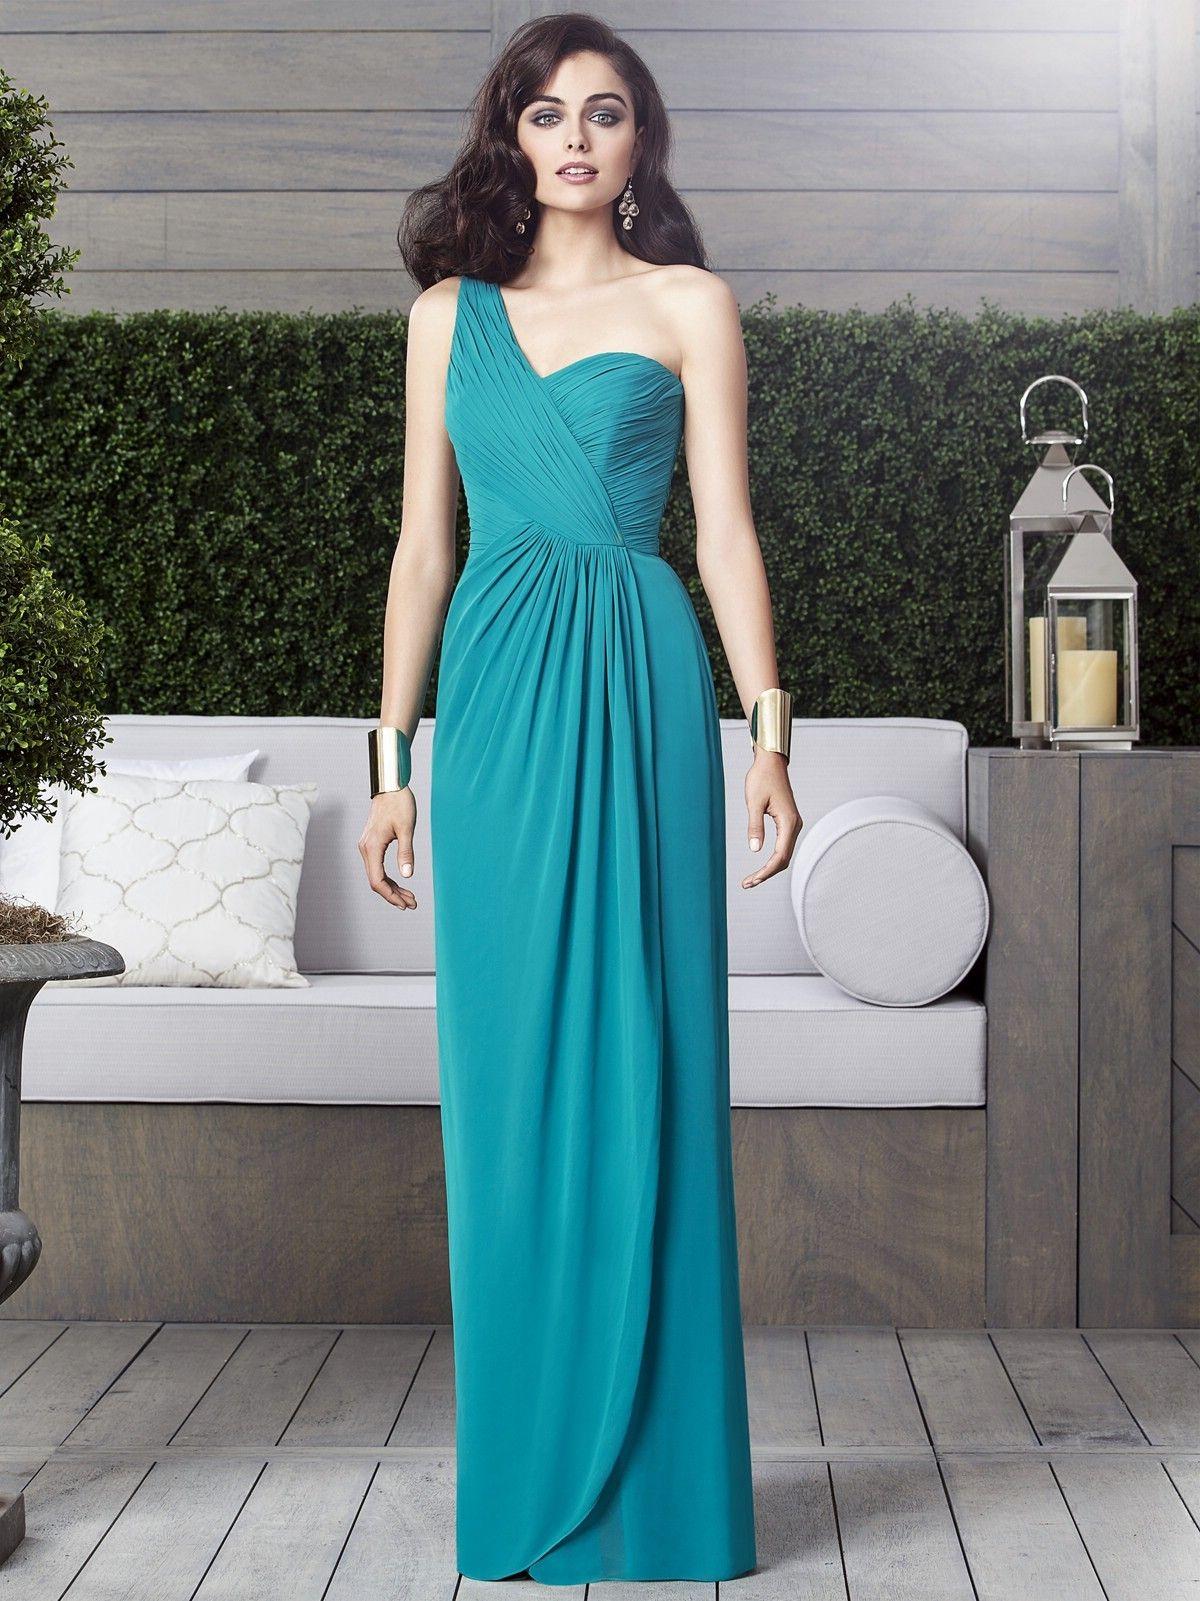 Cerulean blue bridesmaid dresses blue bridesmaid dresses pinterest cerulean blue bridesmaid dresses ombrellifo Gallery